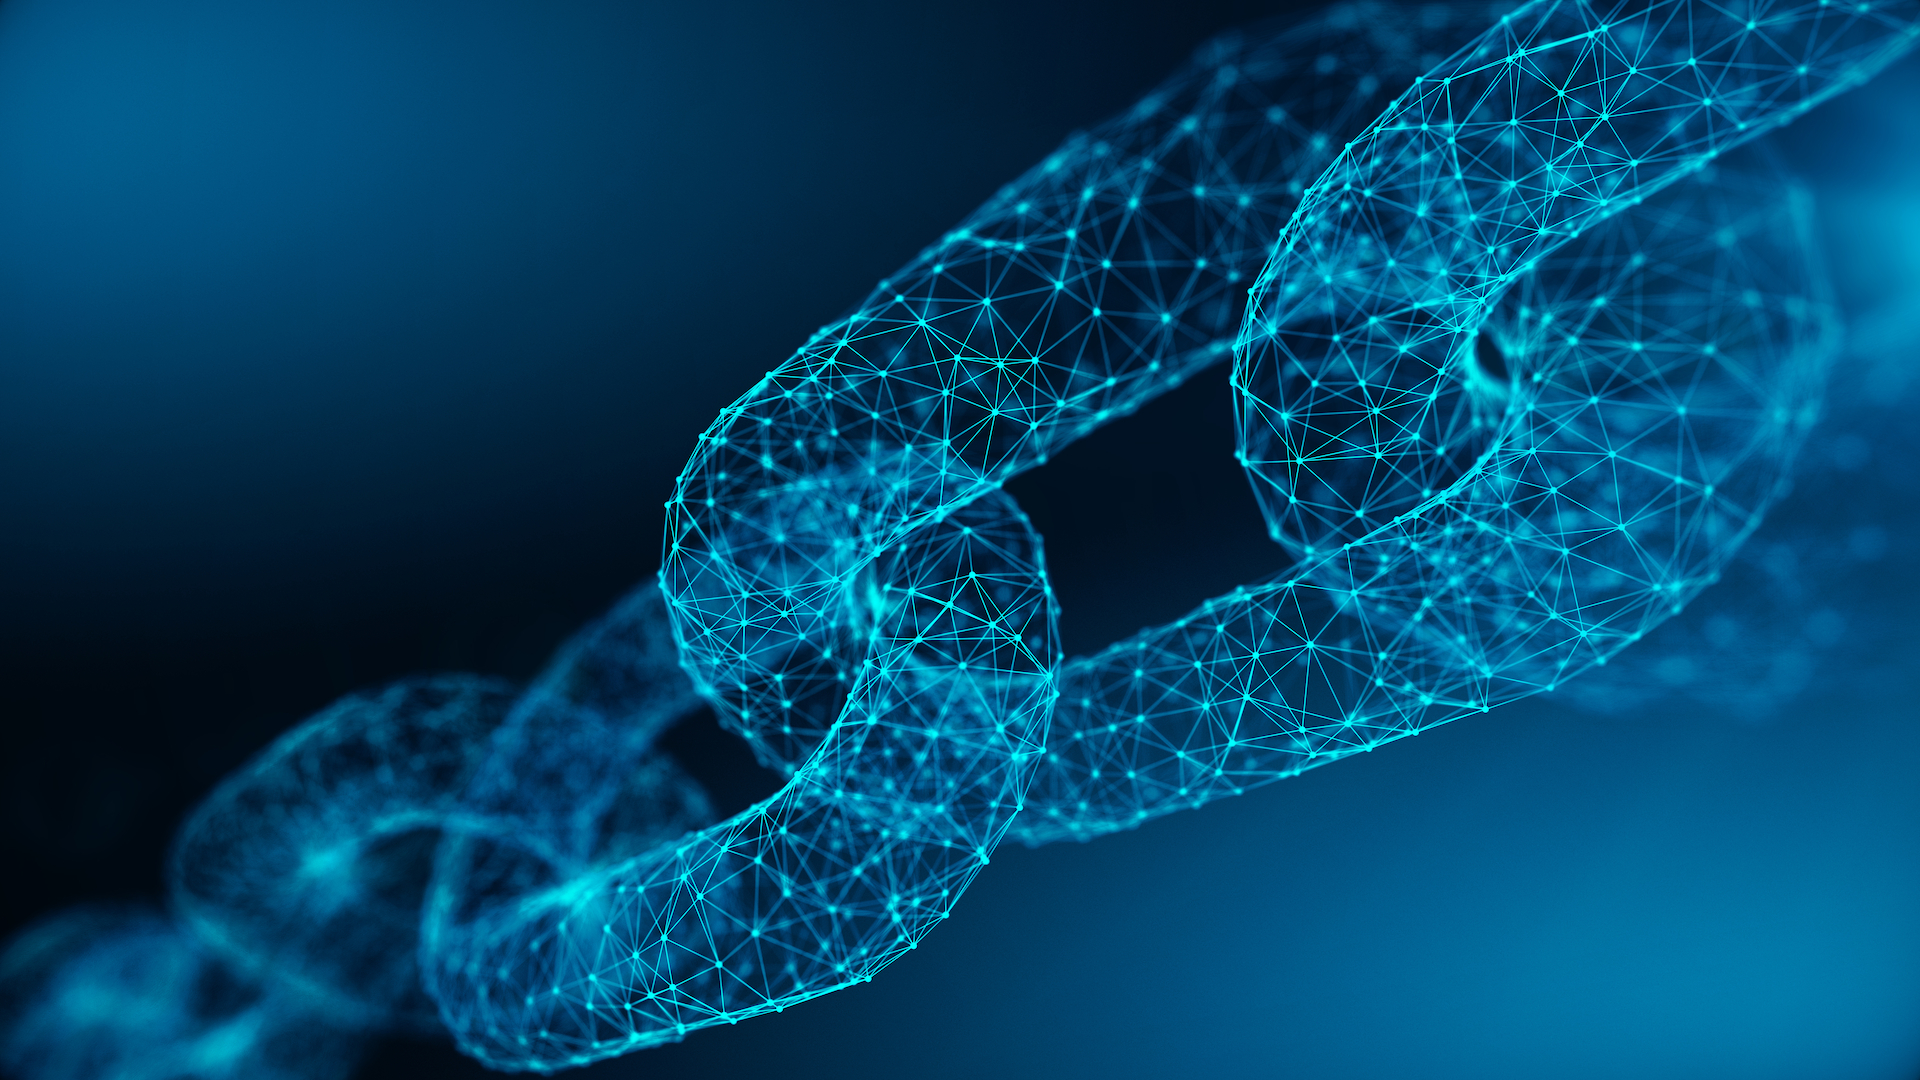 Digital chain concept